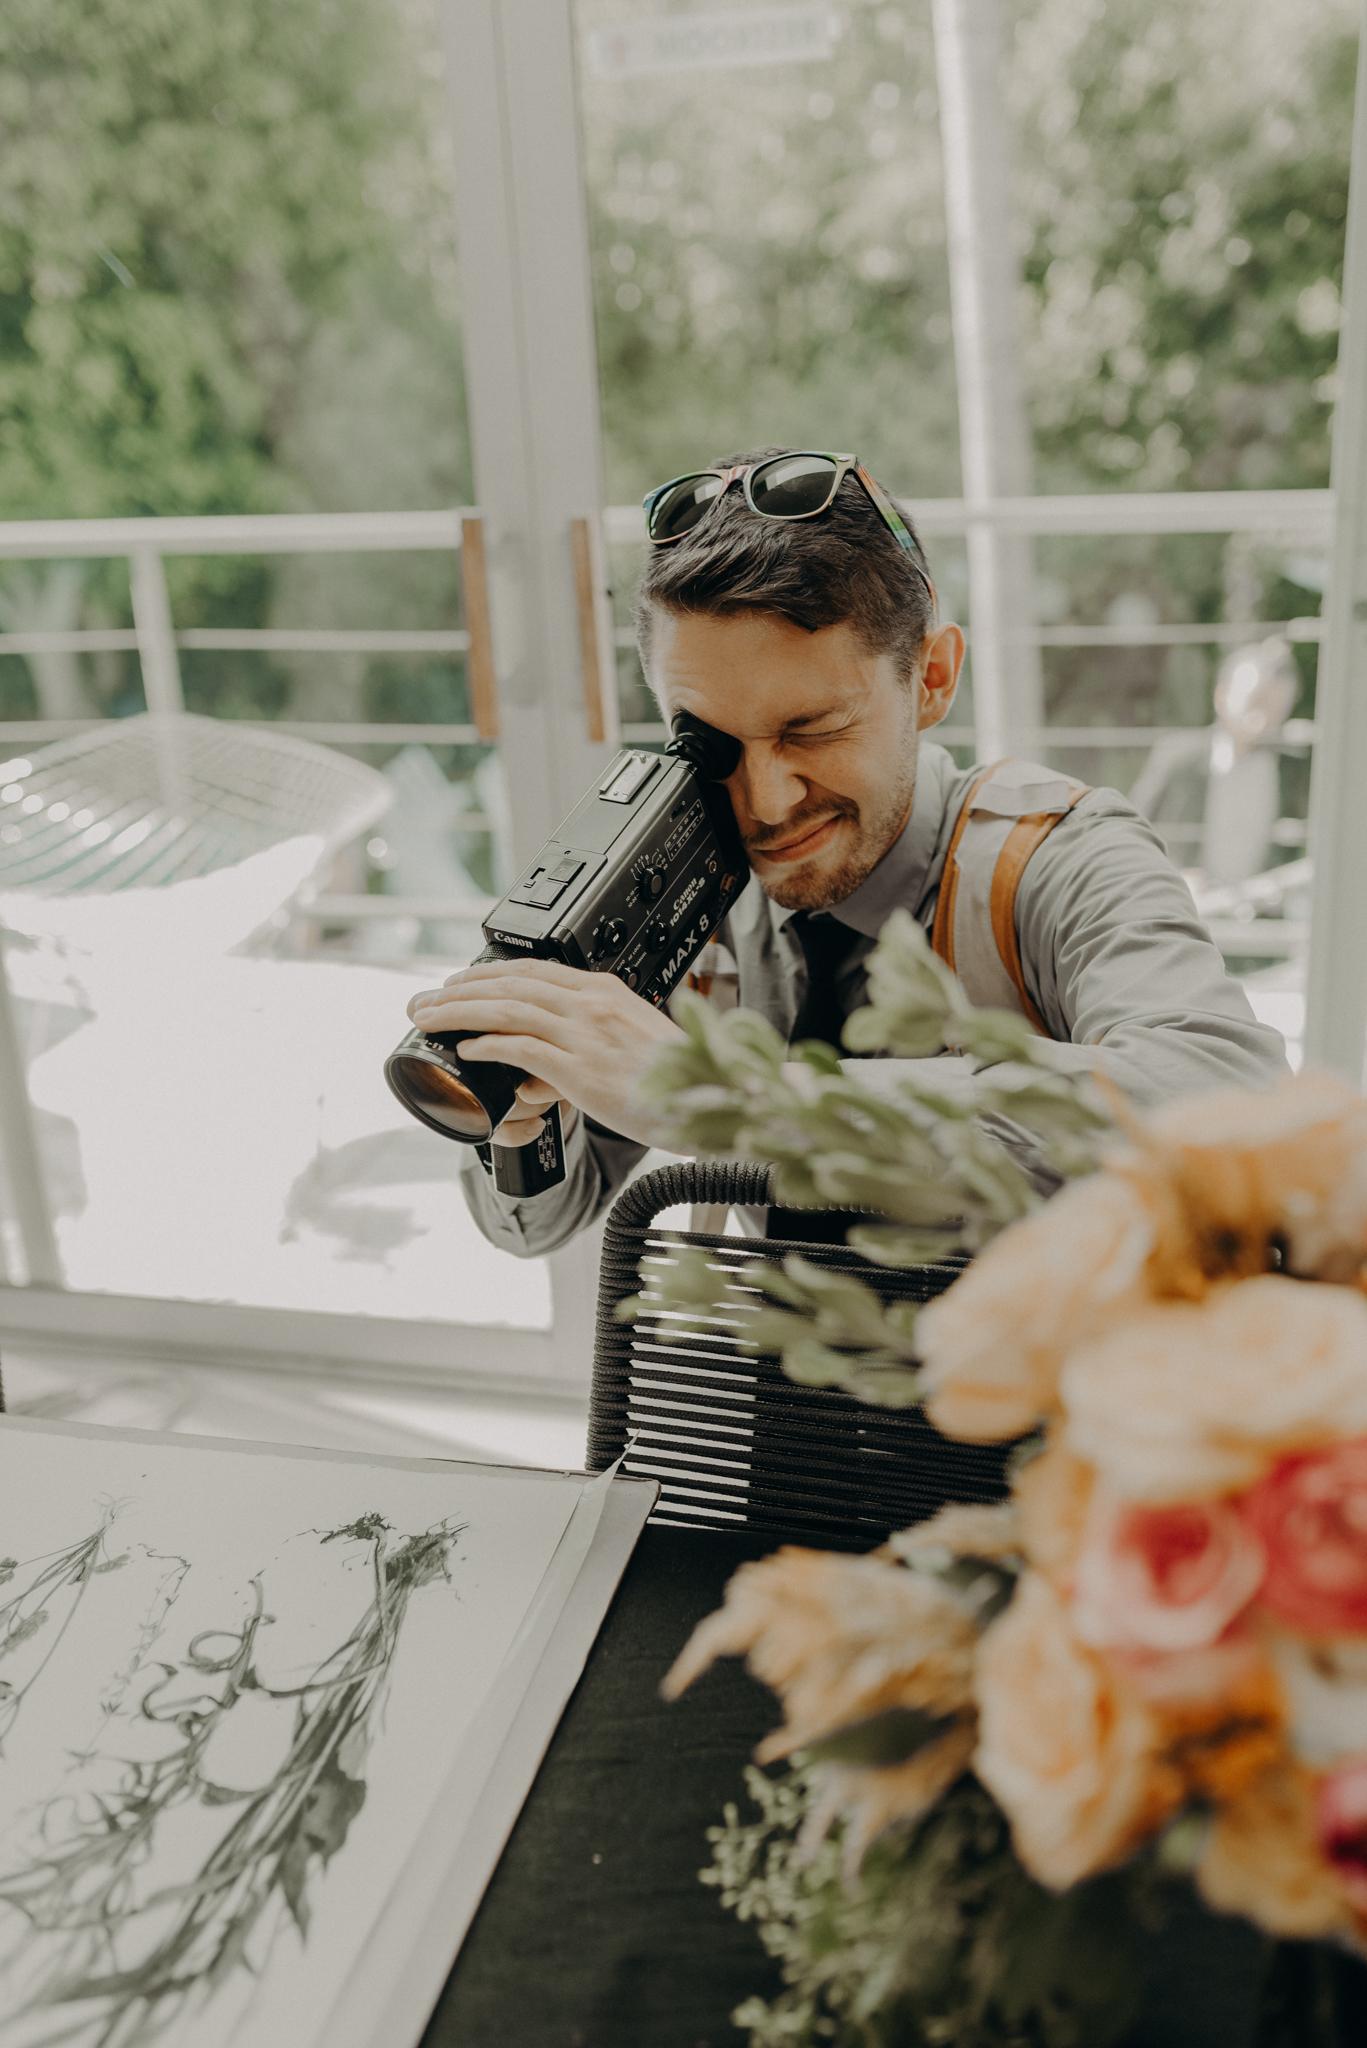 Isaiah + Taylor Photography - Private Estate Backyard Wedding - Beverly Hills - Los Angeles Wedding Photographer - 56.jpg